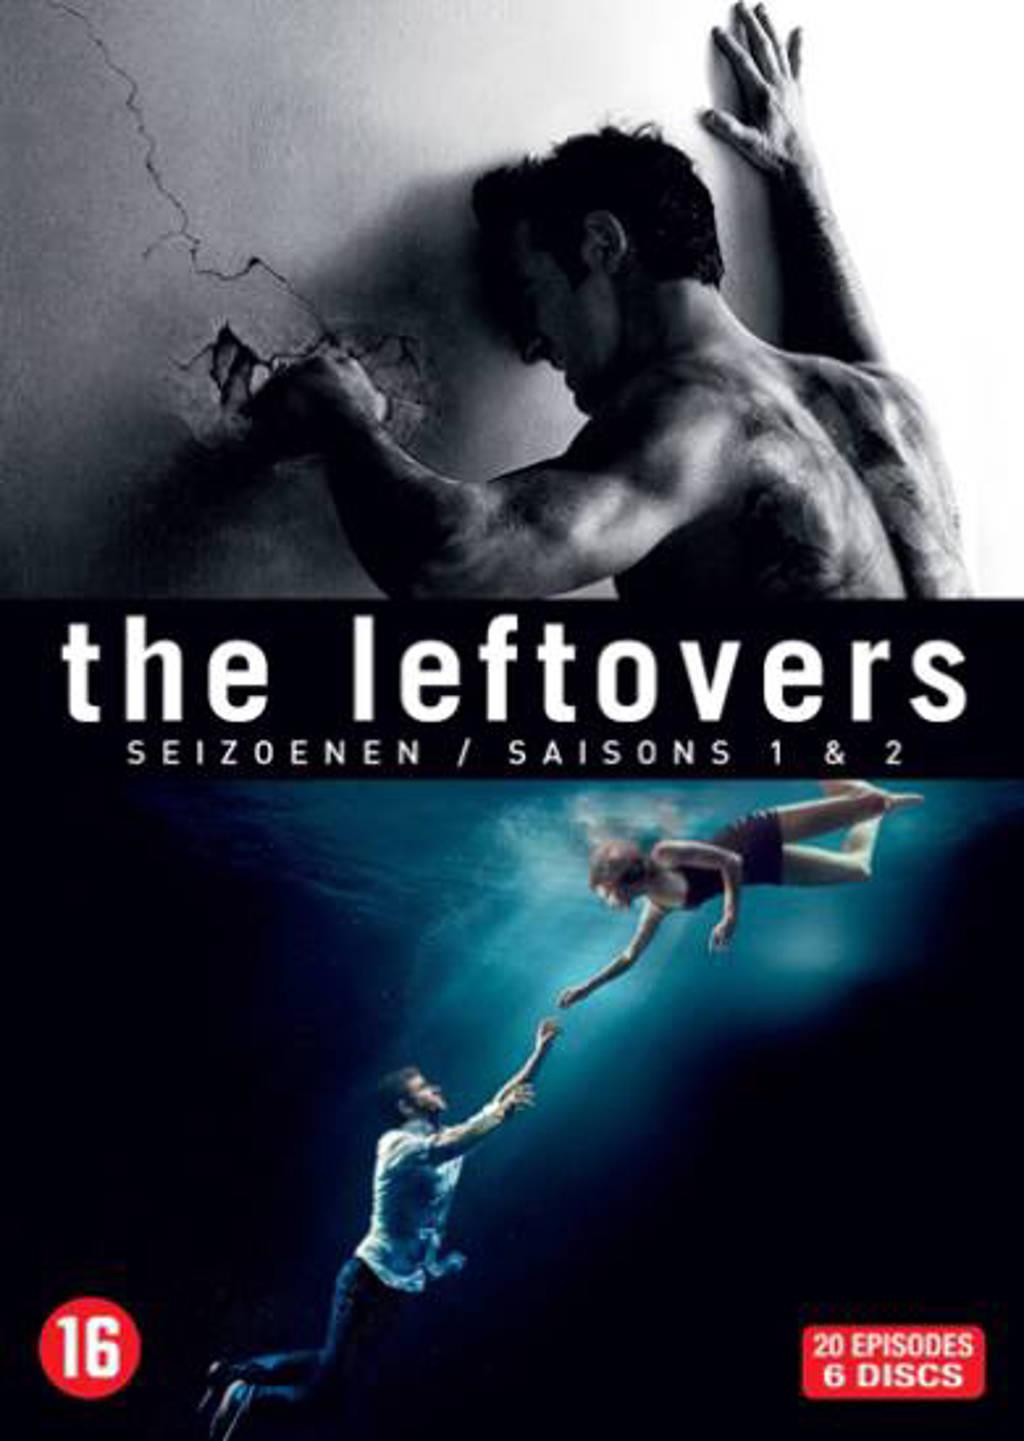 Leftovers - Seizoen 1 & 2 (DVD)